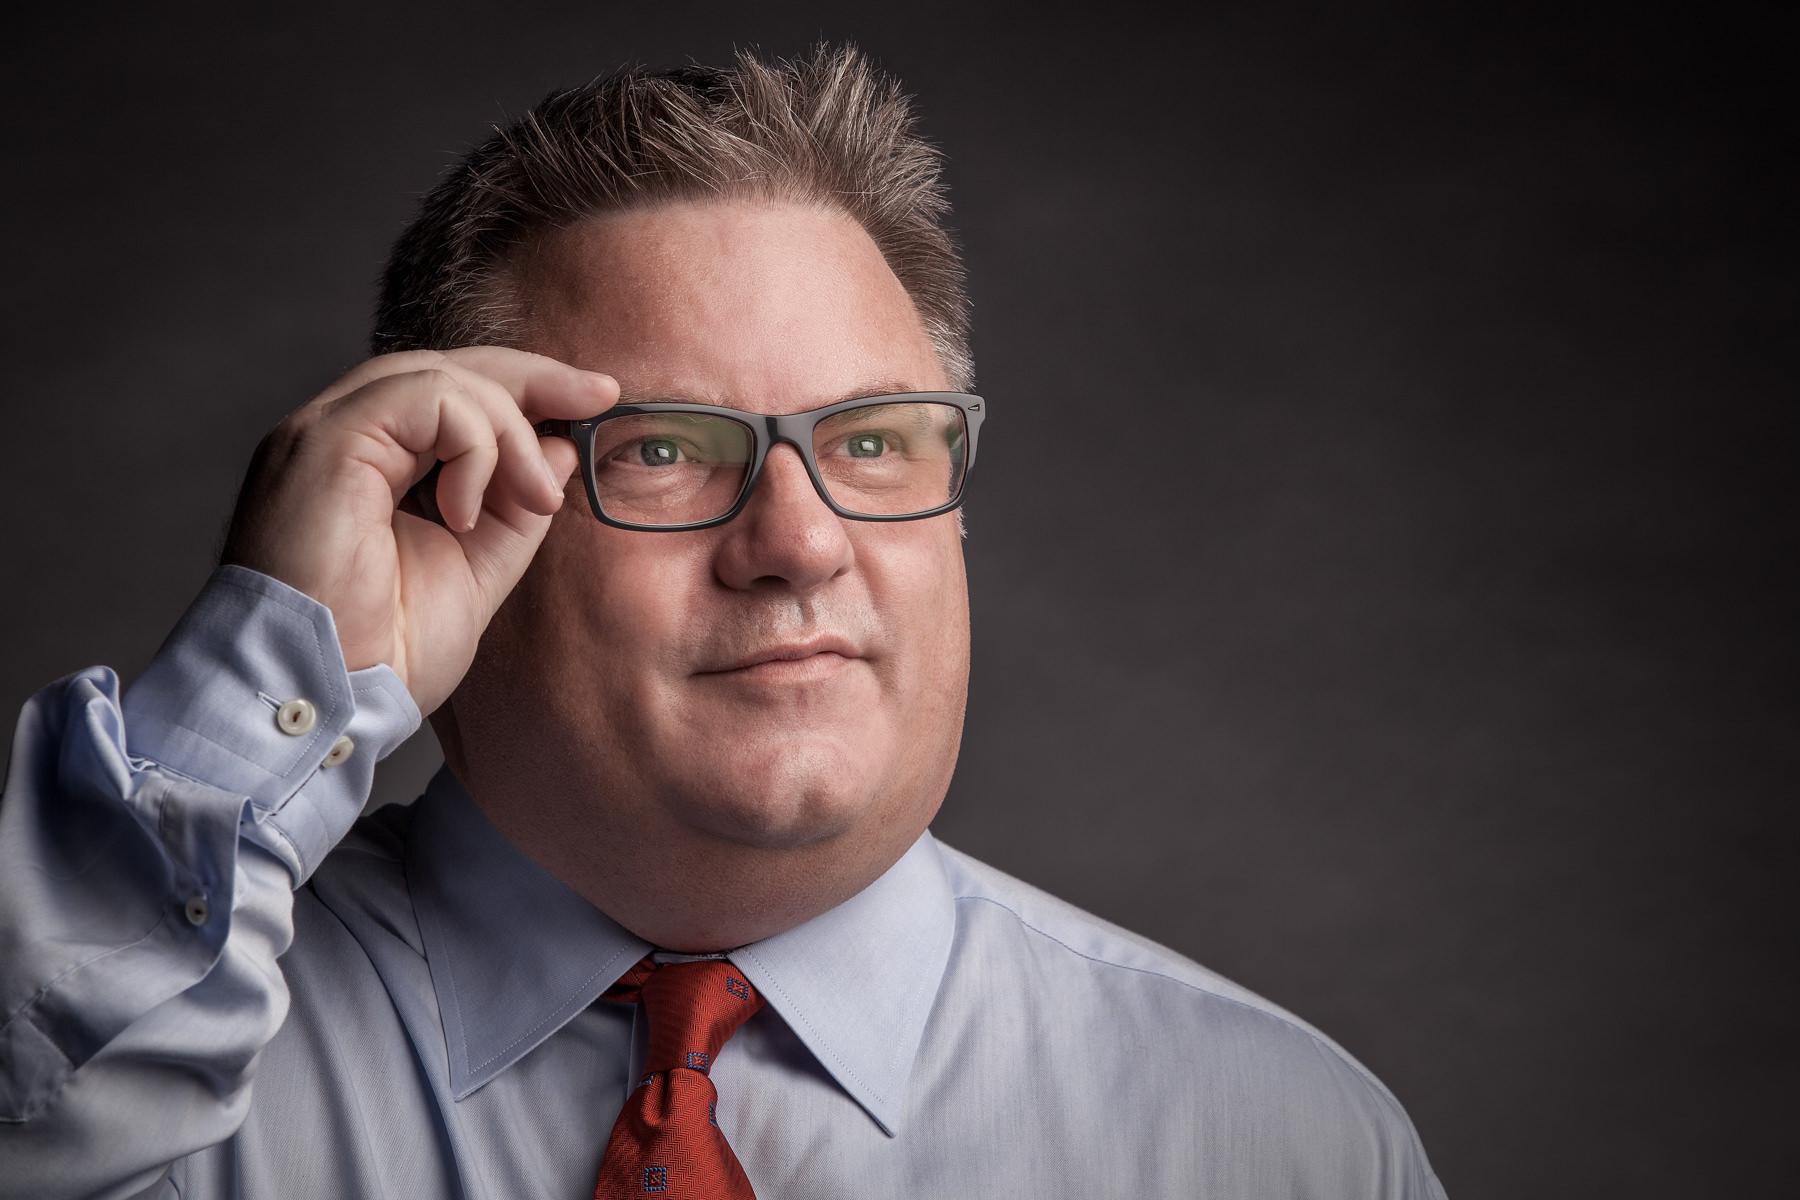 Male glasses